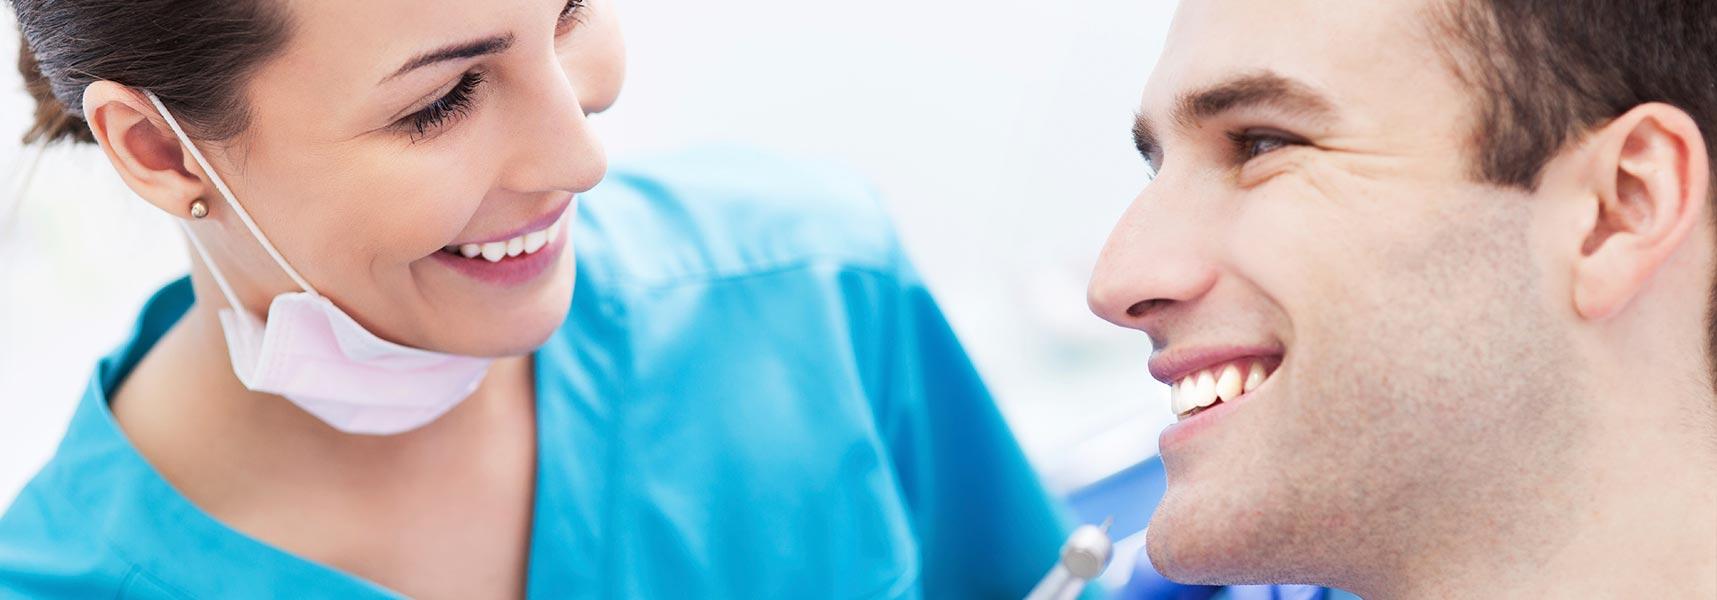 dentista-reggiolo-igiene